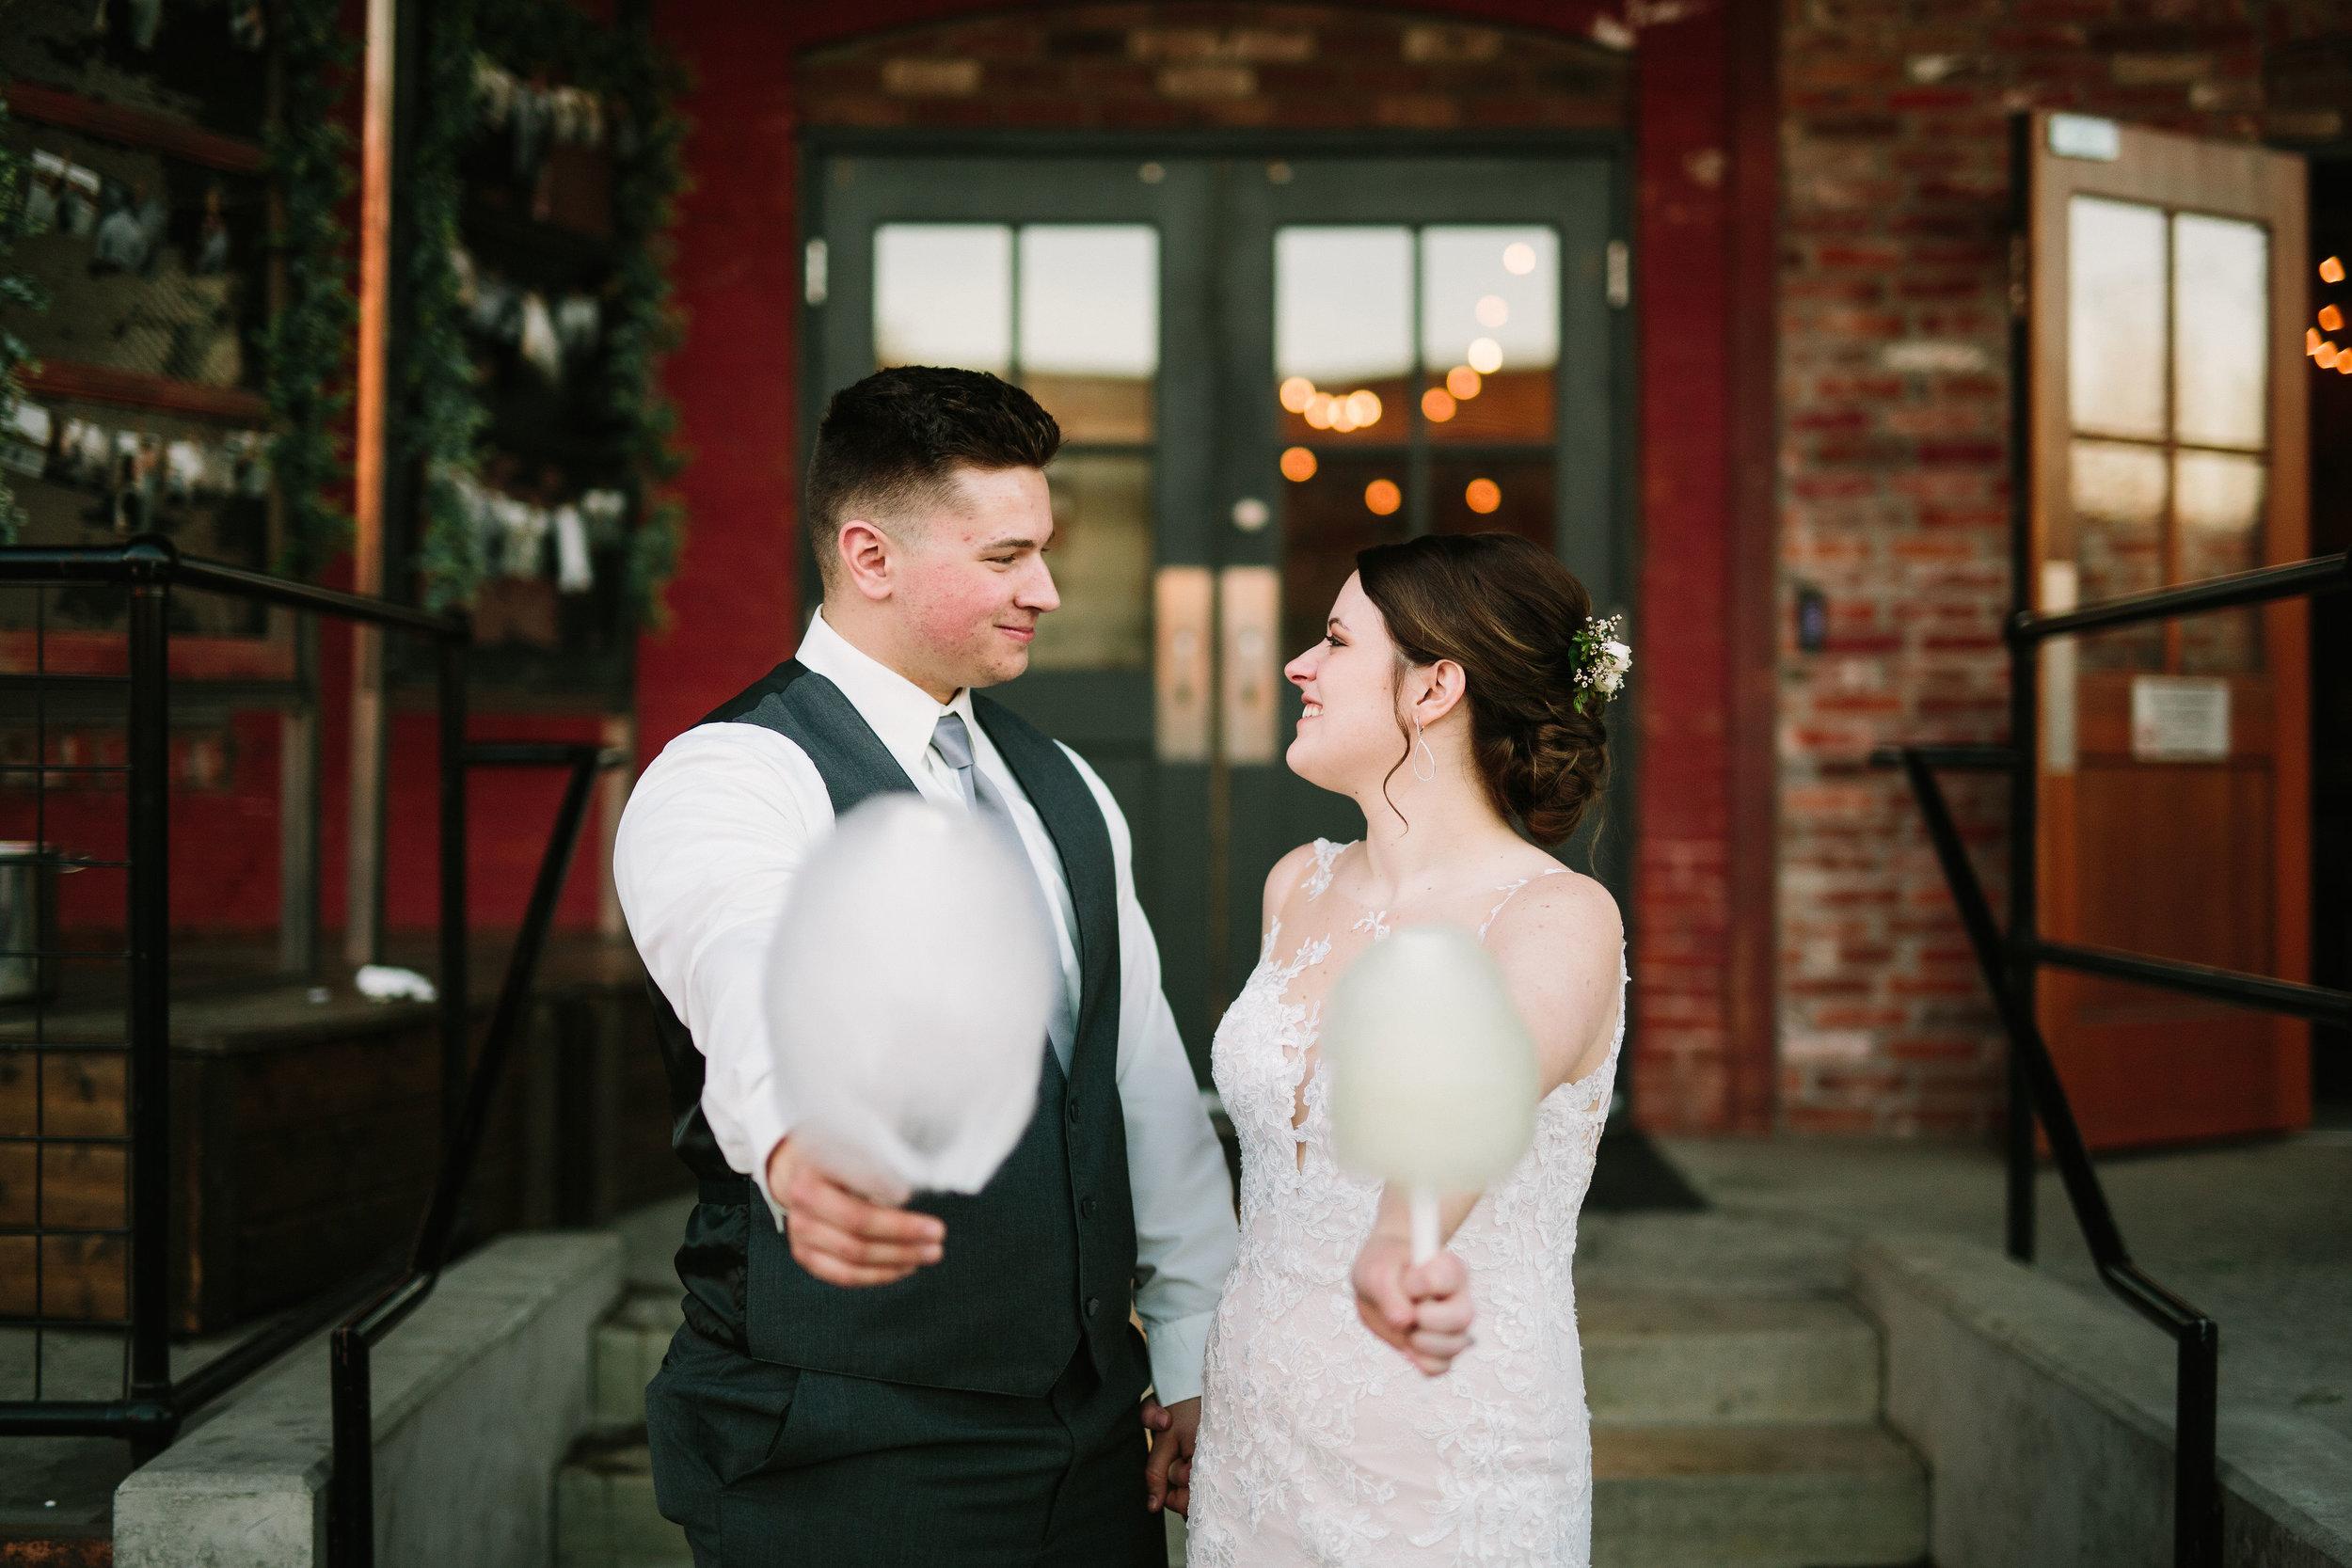 Fun Rustic spokane wedding vibes cotton candy machine carnival hair updo